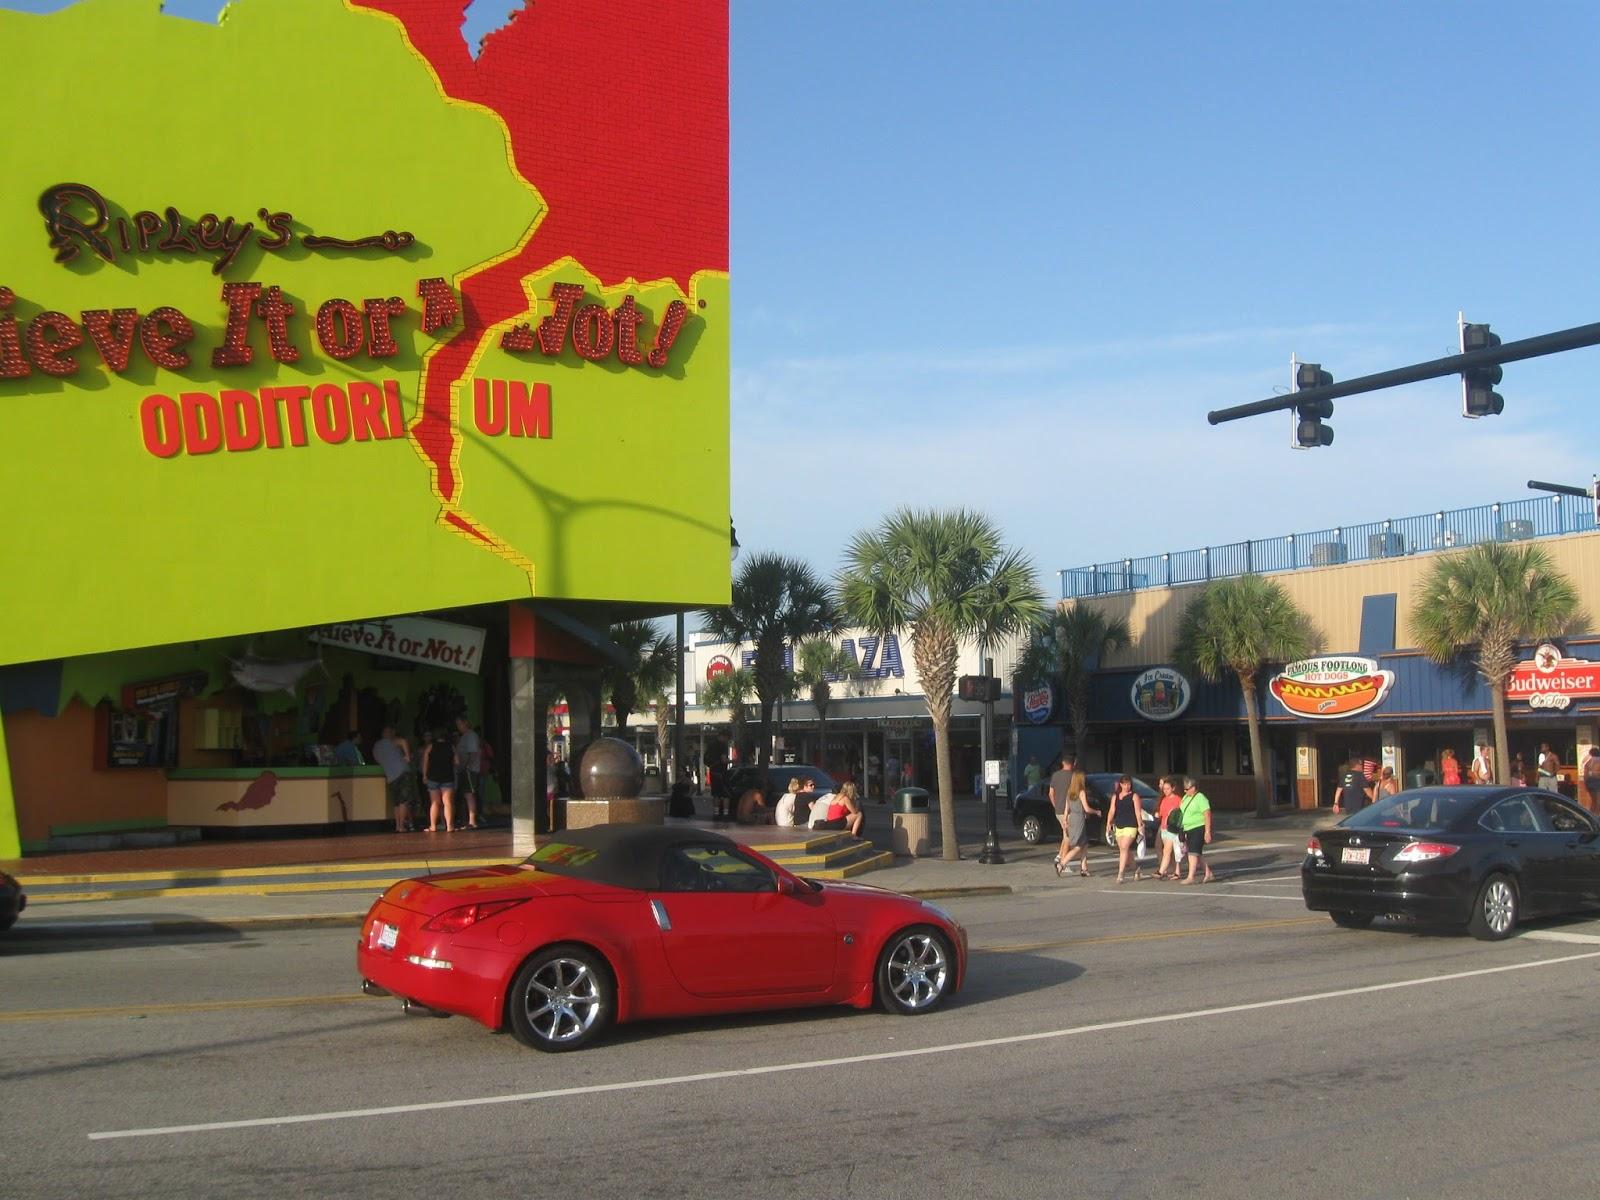 Myrtle Beach Attractions Ripley S Believe It Or Not Odditorium